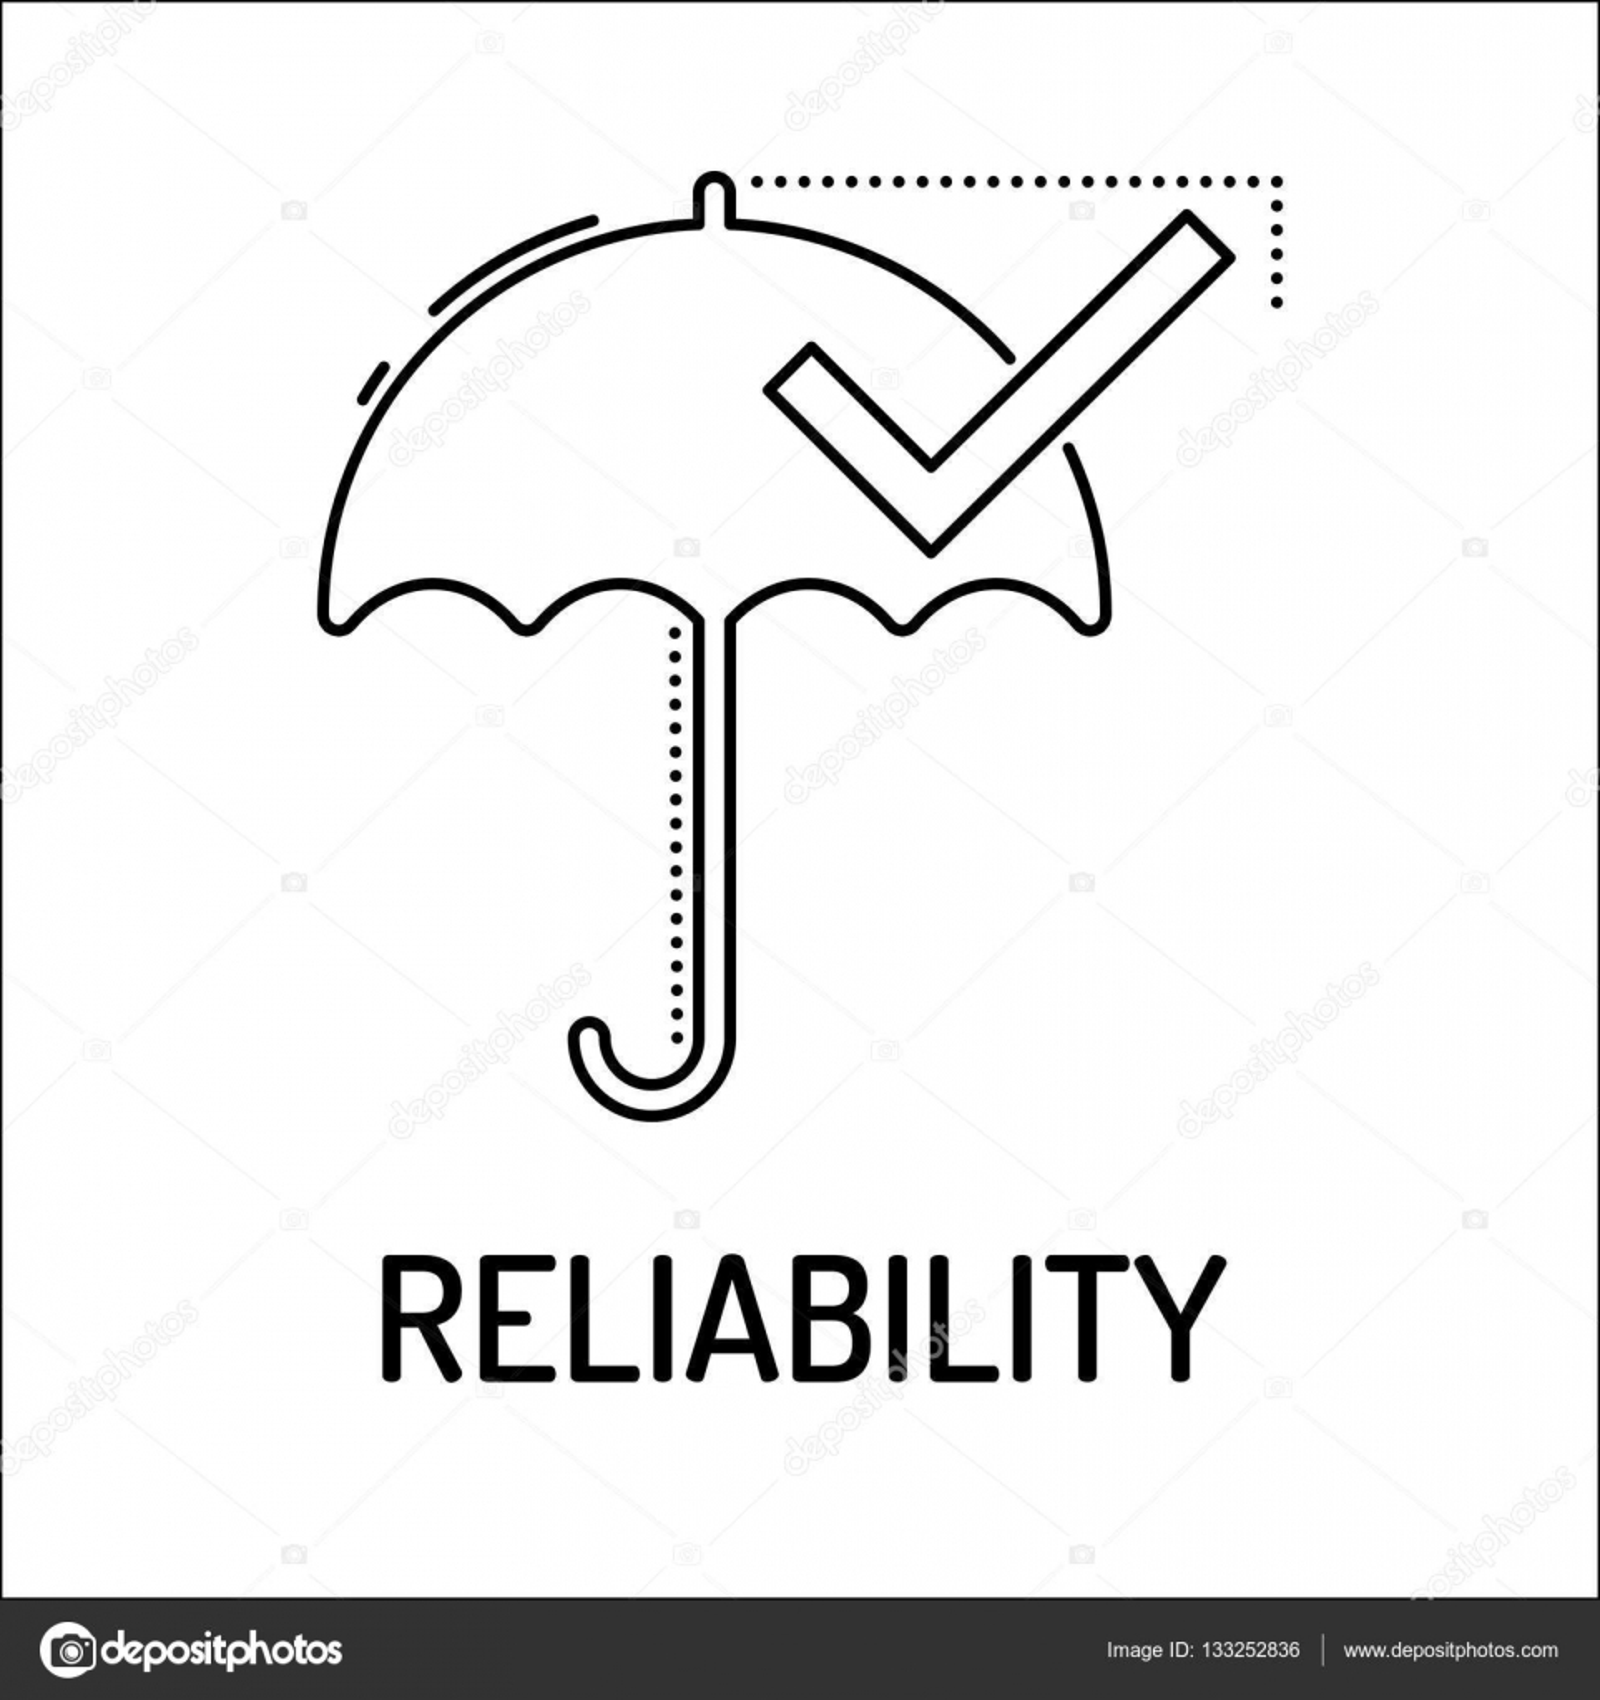 RELIABILITY Line icon — Stock Vector © garagestock #133252836